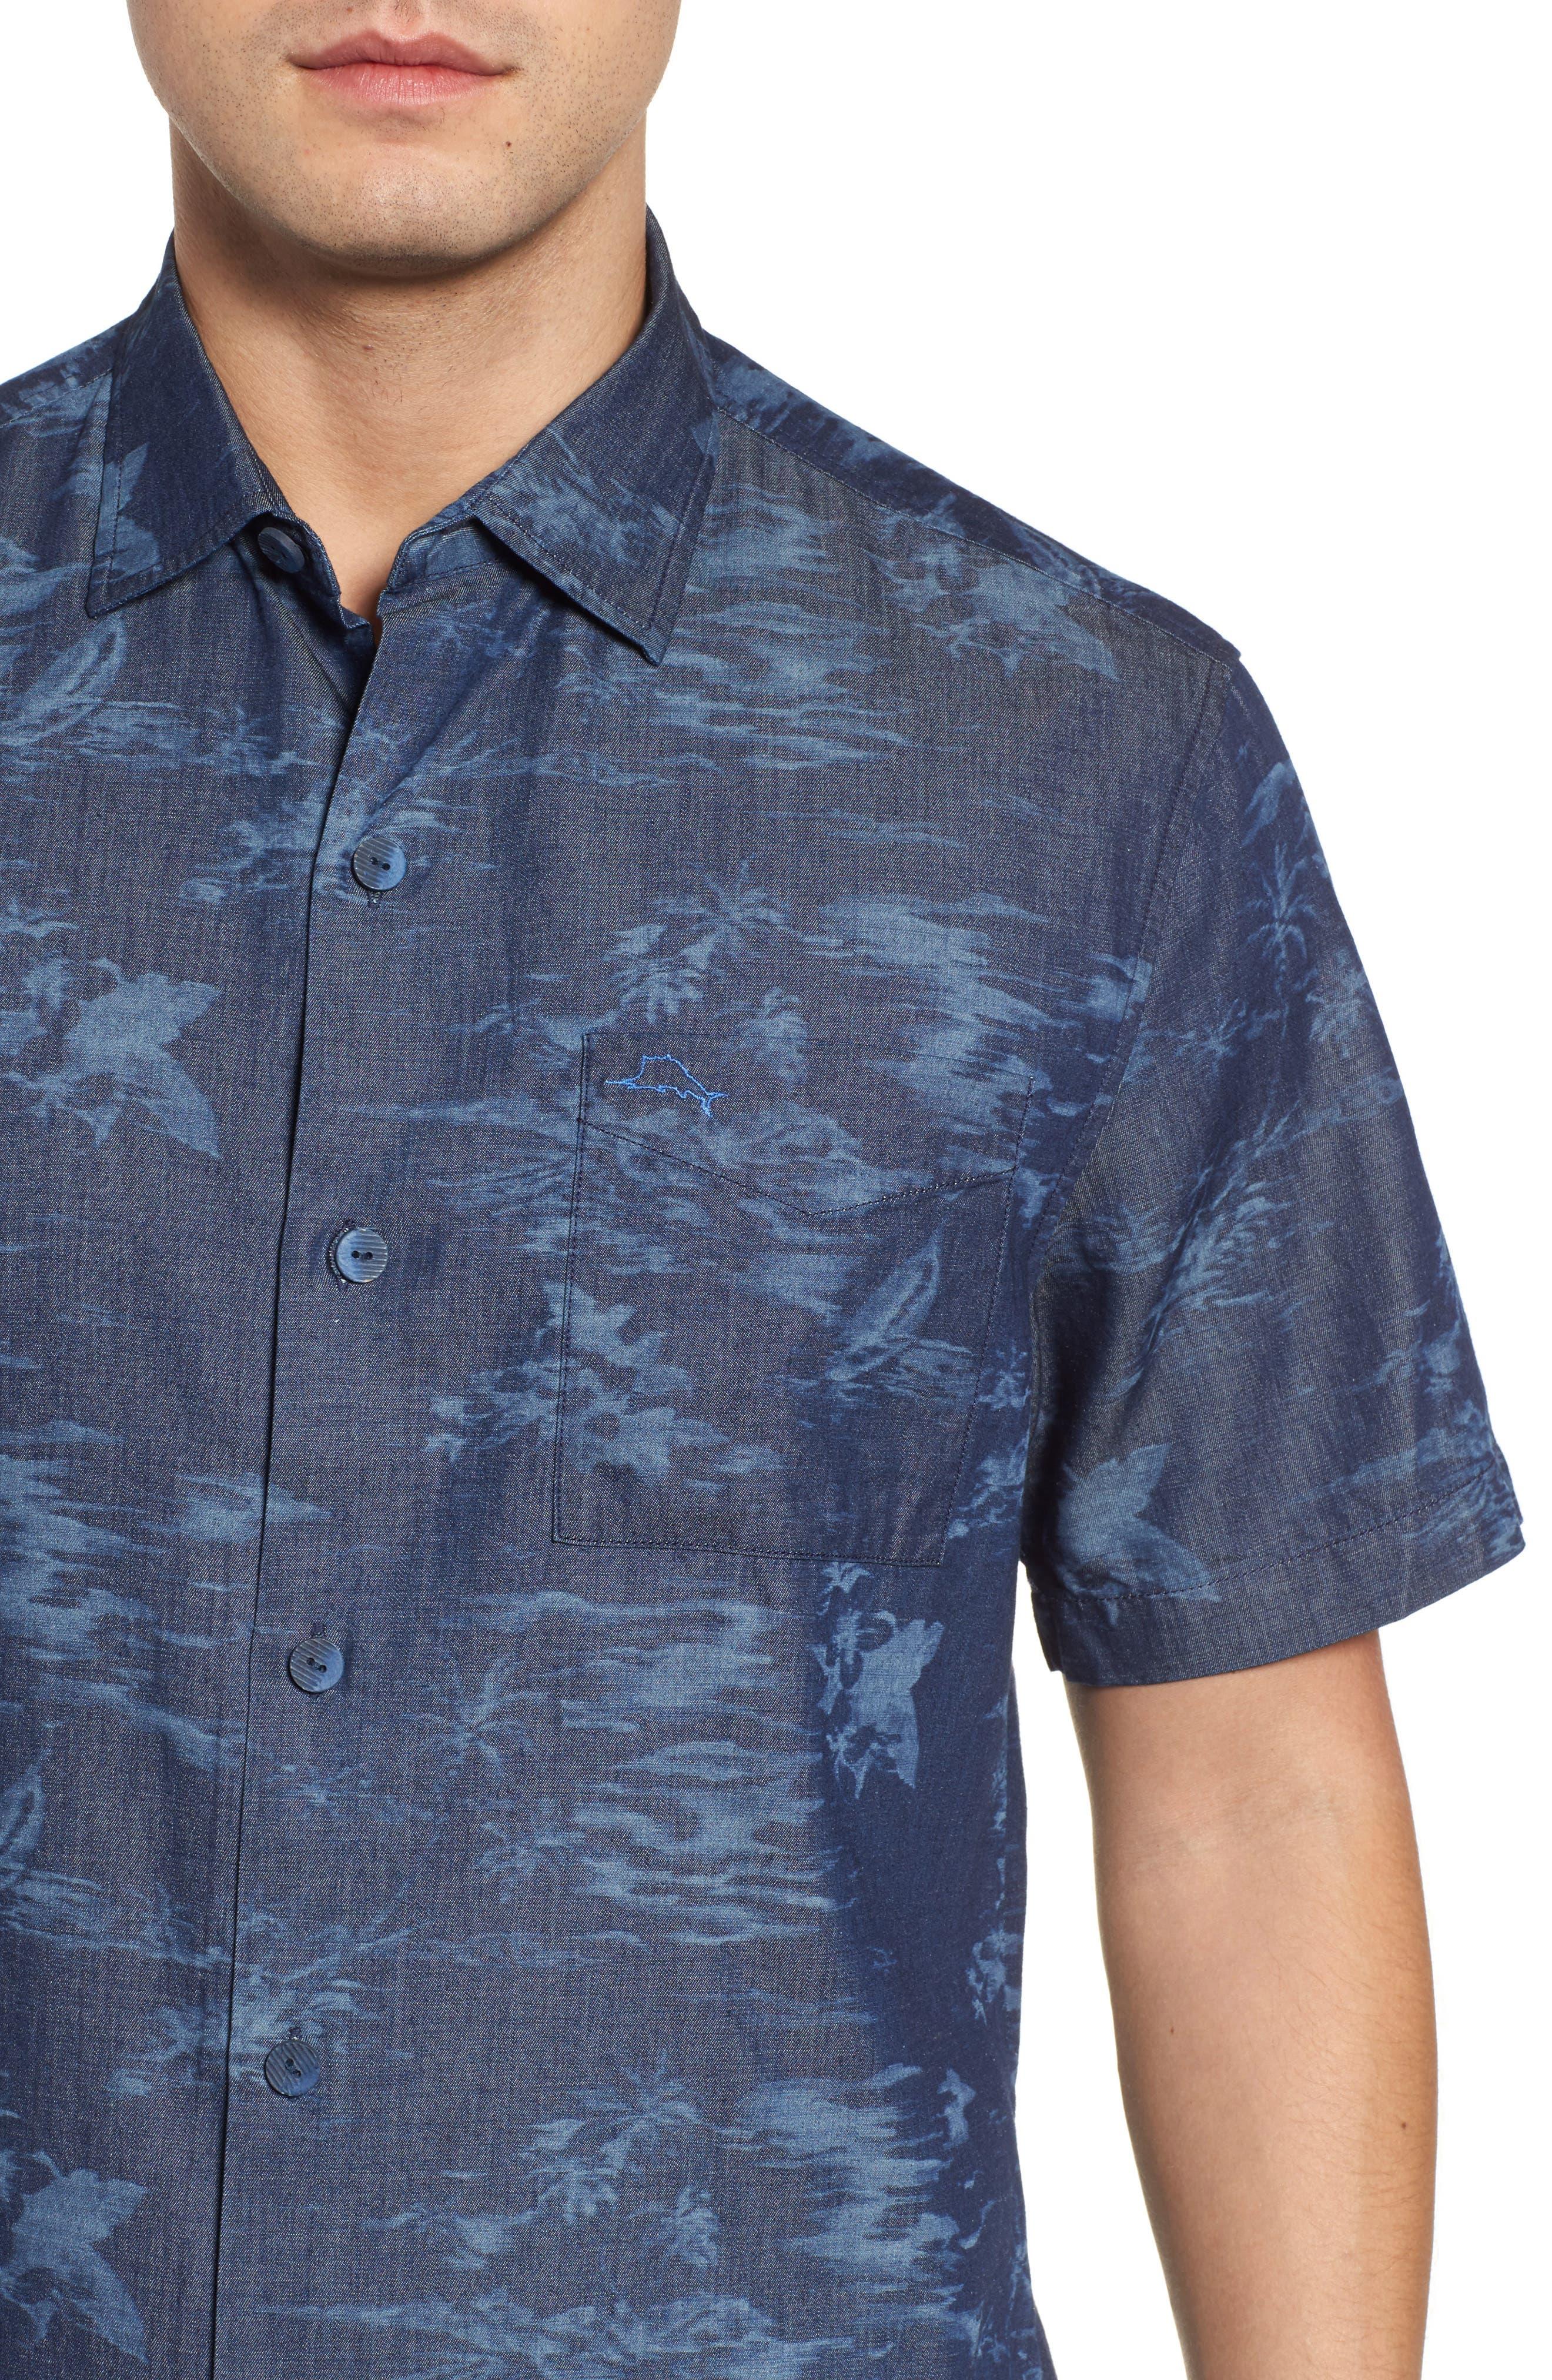 South Beach Scenic Sport Shirt,                             Alternate thumbnail 4, color,                             Indigo